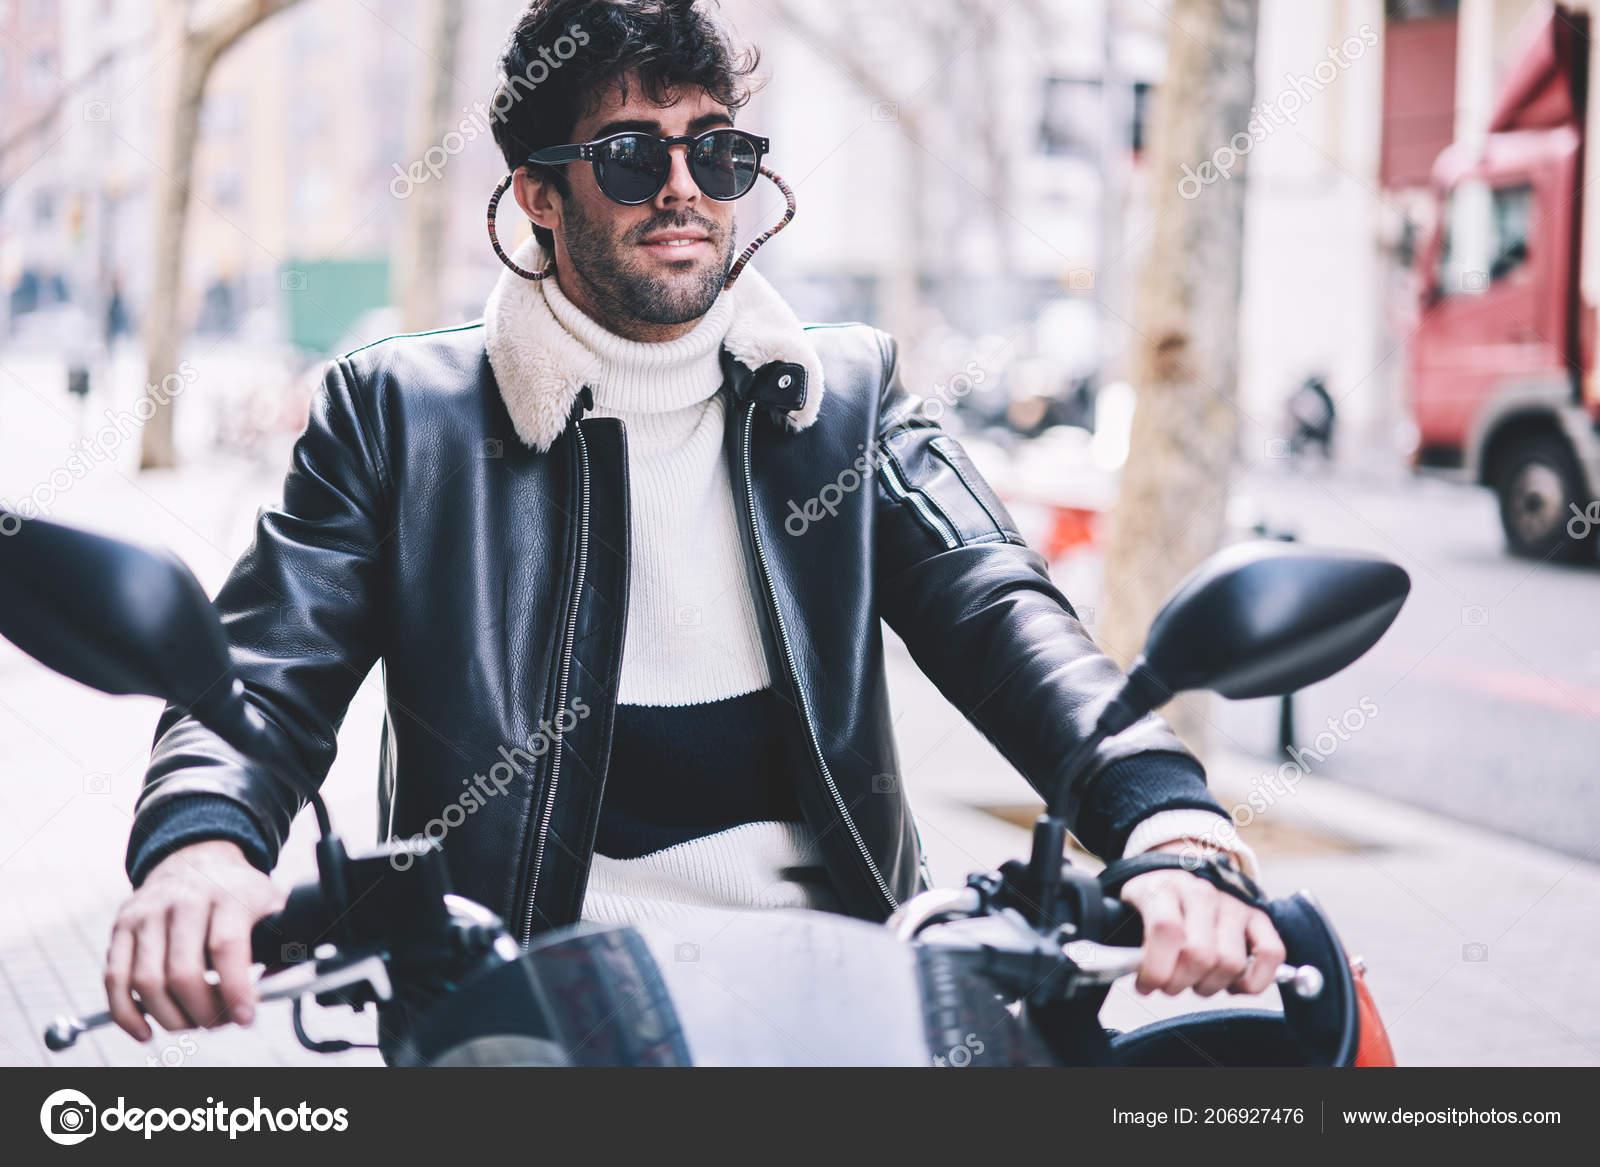 01457a93c4 Όμορφος Μοντέρνος Νεαρός Άνδρας Στο Δροσερό Μαύρα Γυαλιά Ηλίου Οδήγησης — Φωτογραφία  Αρχείου